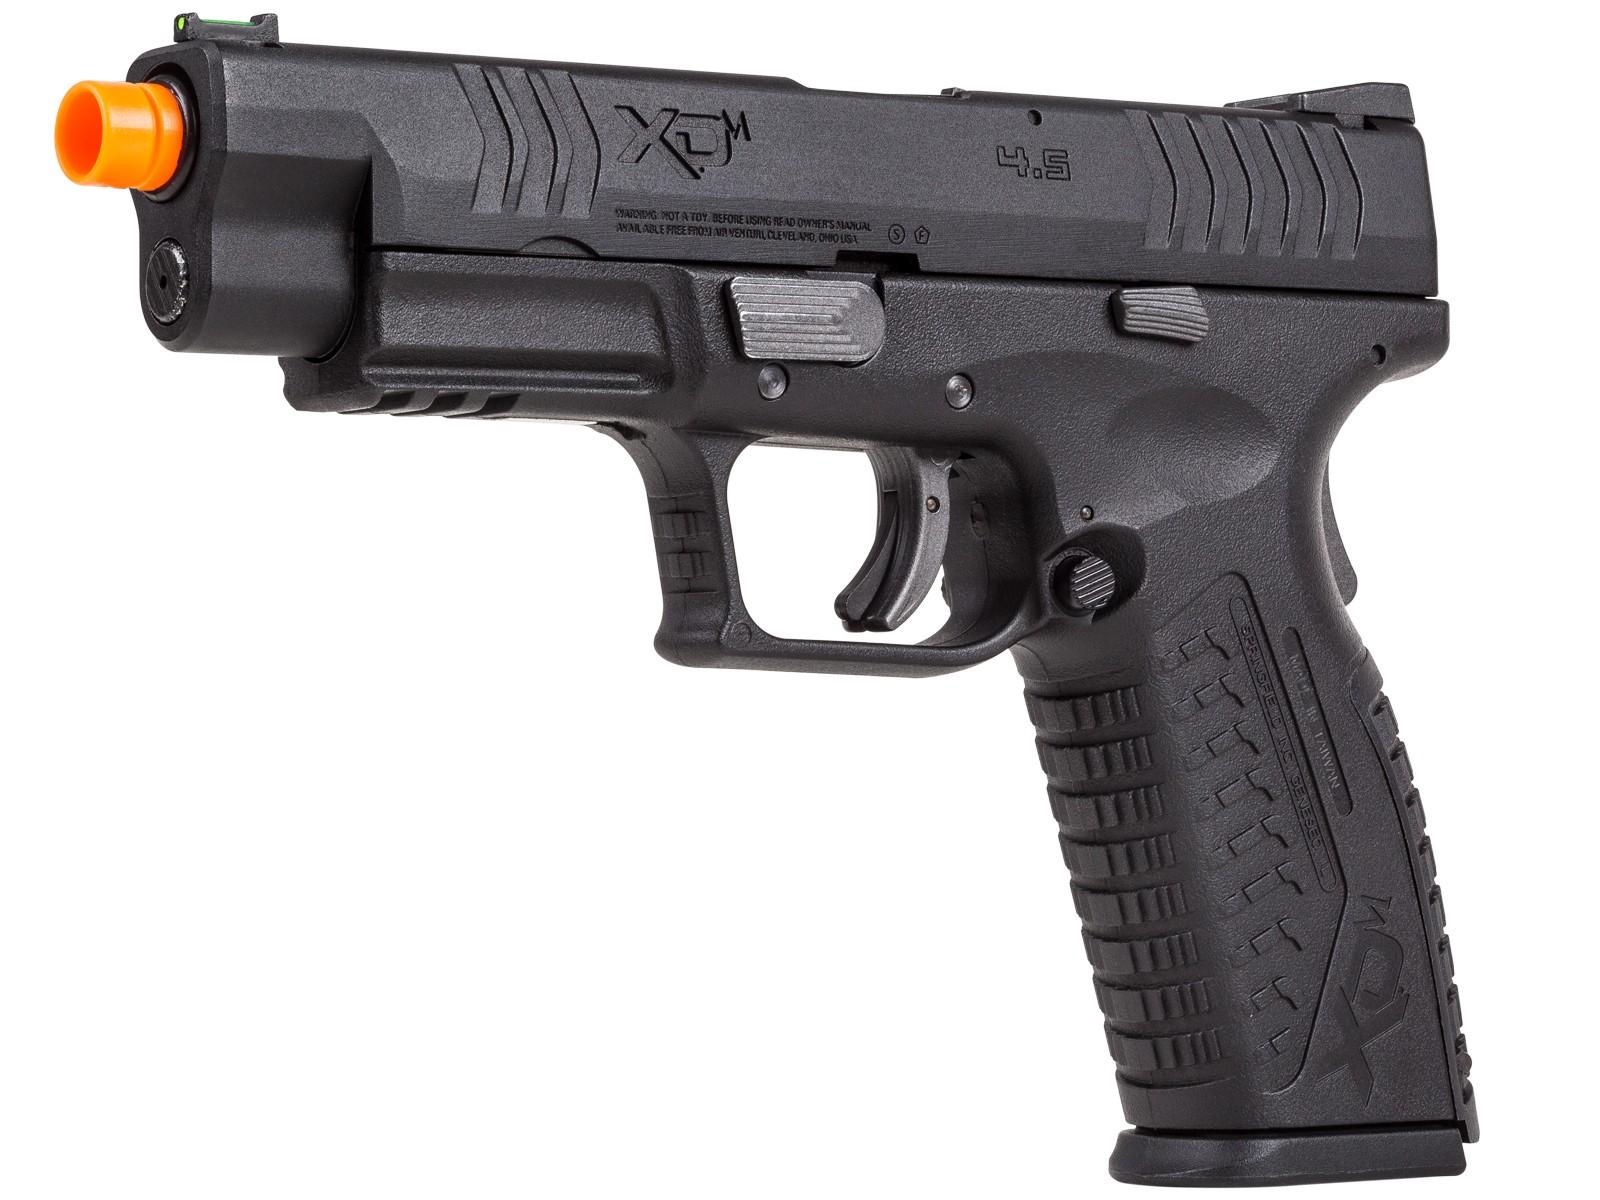 Springfield_Armory_XDM_45_GBB_Airsoft_Pistol_Black_6mm